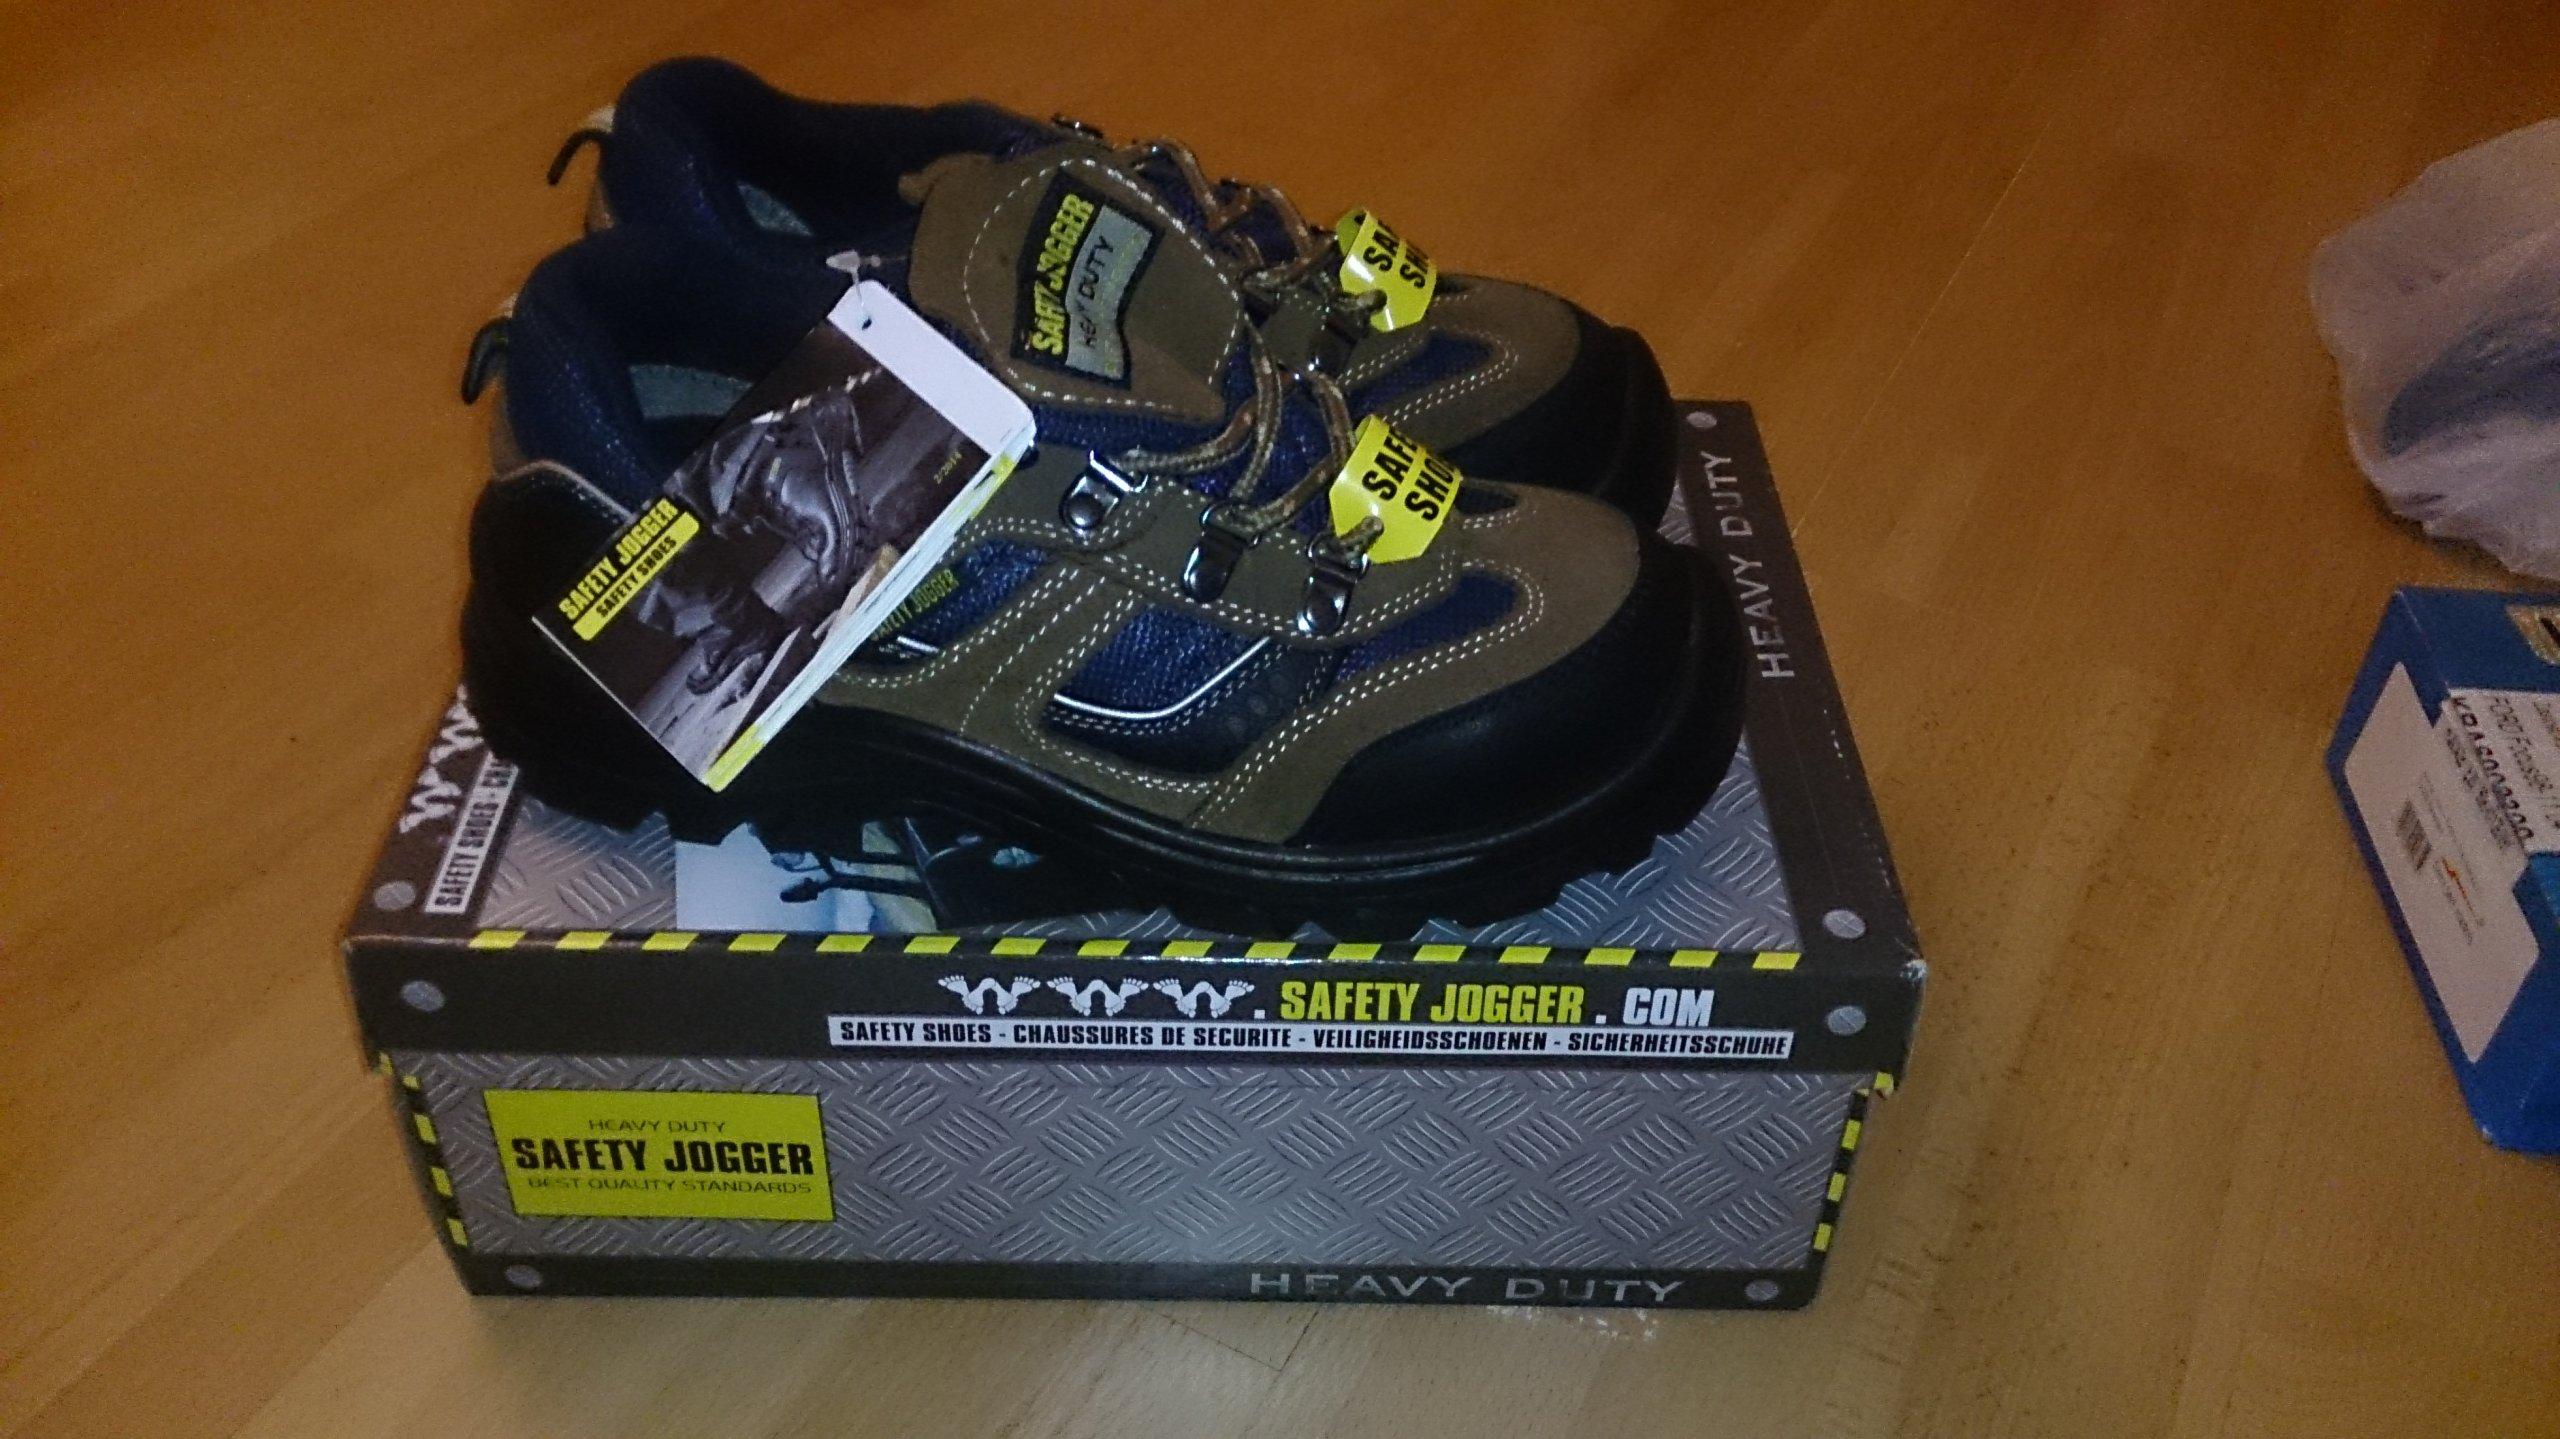 Buty robocze Haevy Dutty mod Safety Jogger r39